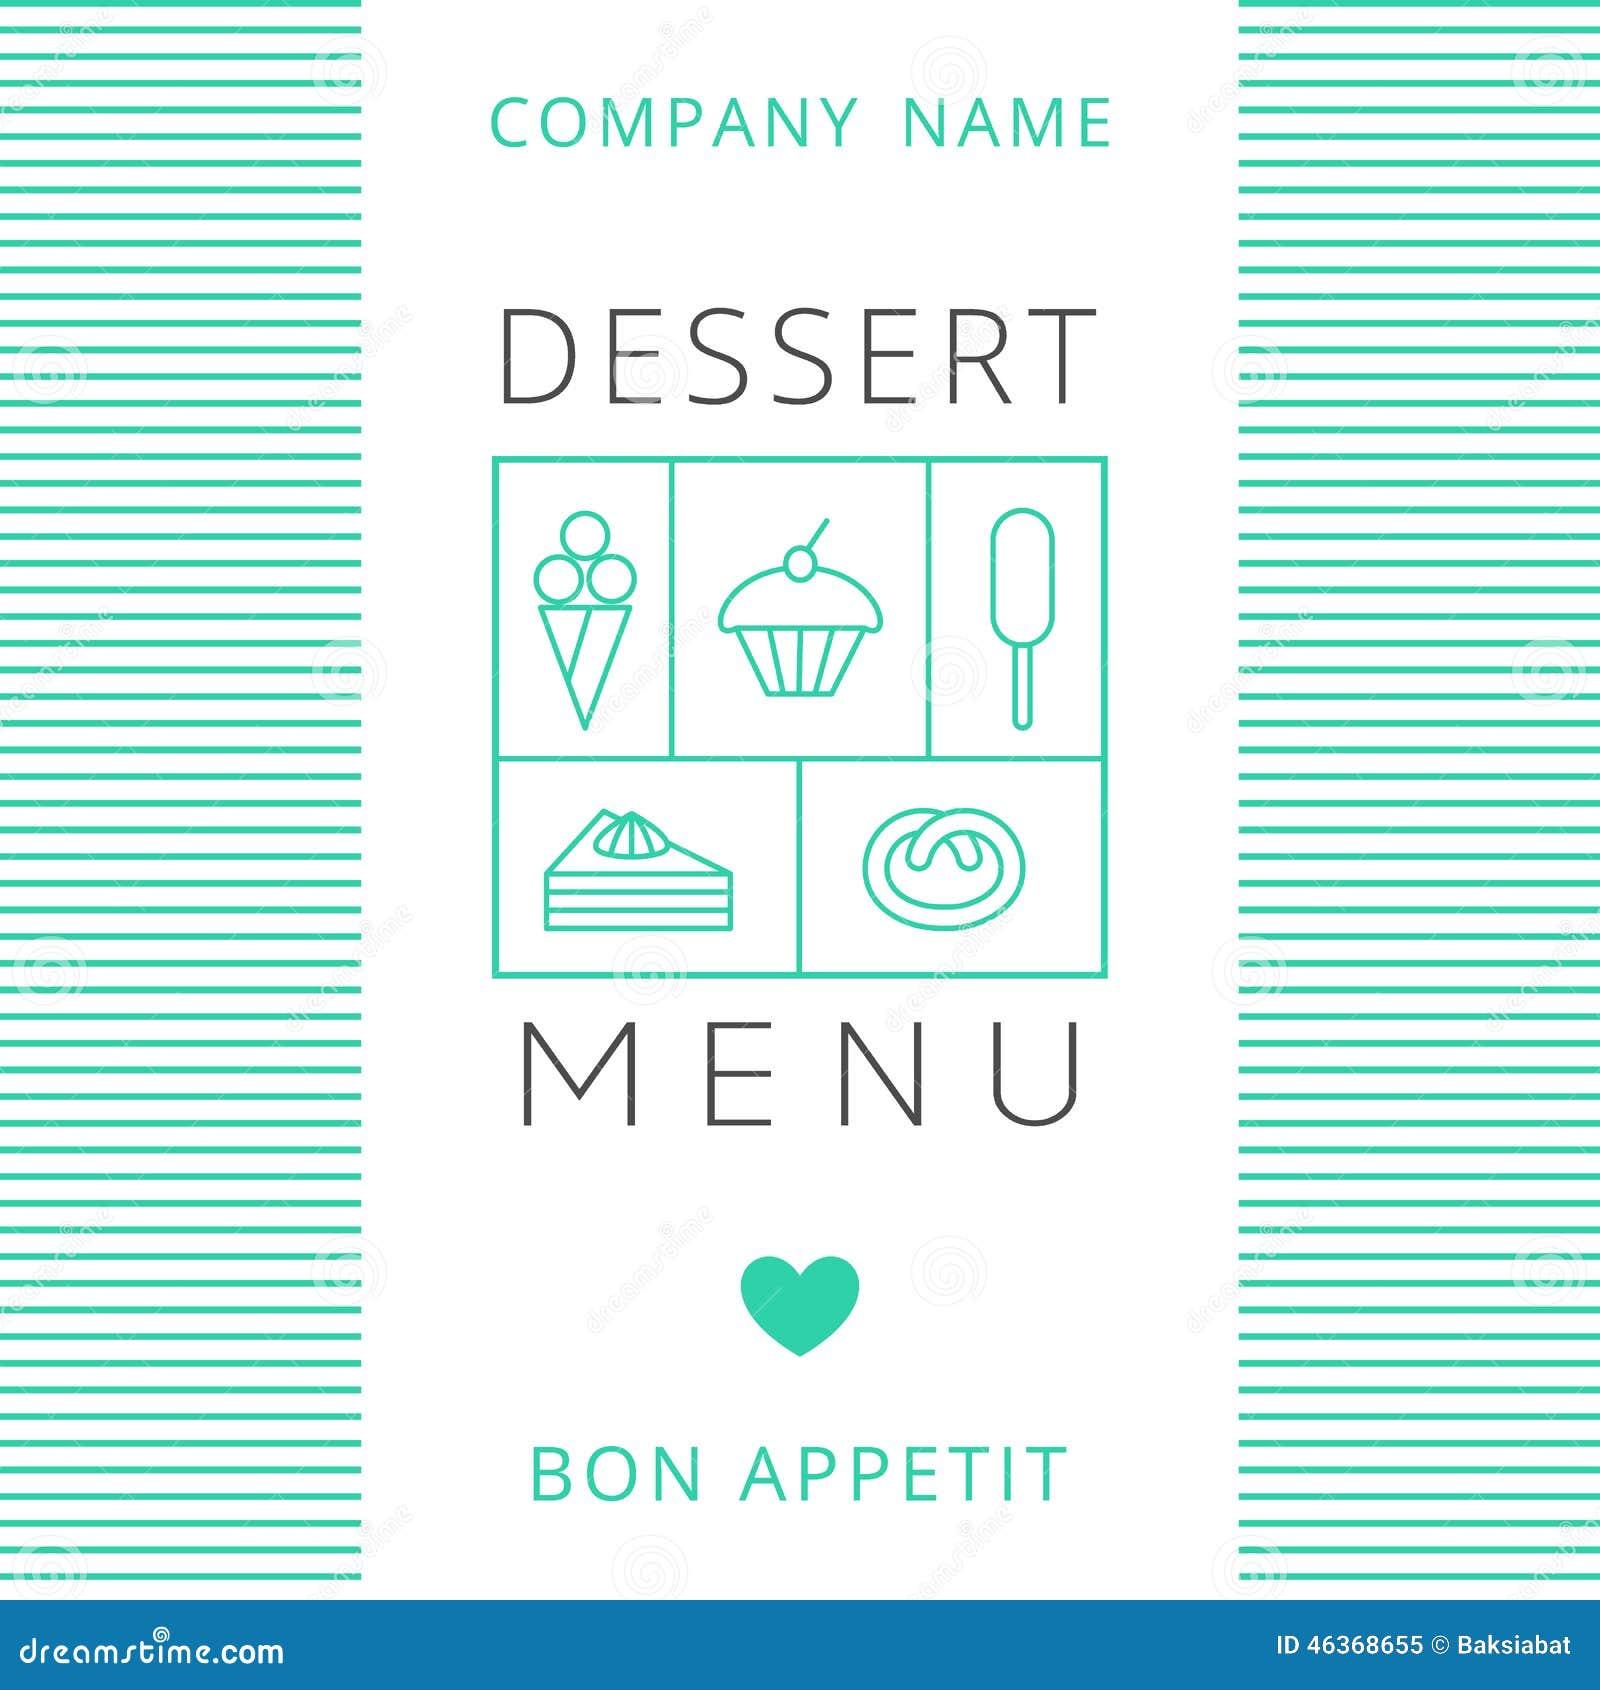 dessert menu card design template stock vector illustration of icon cream 46368655. Black Bedroom Furniture Sets. Home Design Ideas